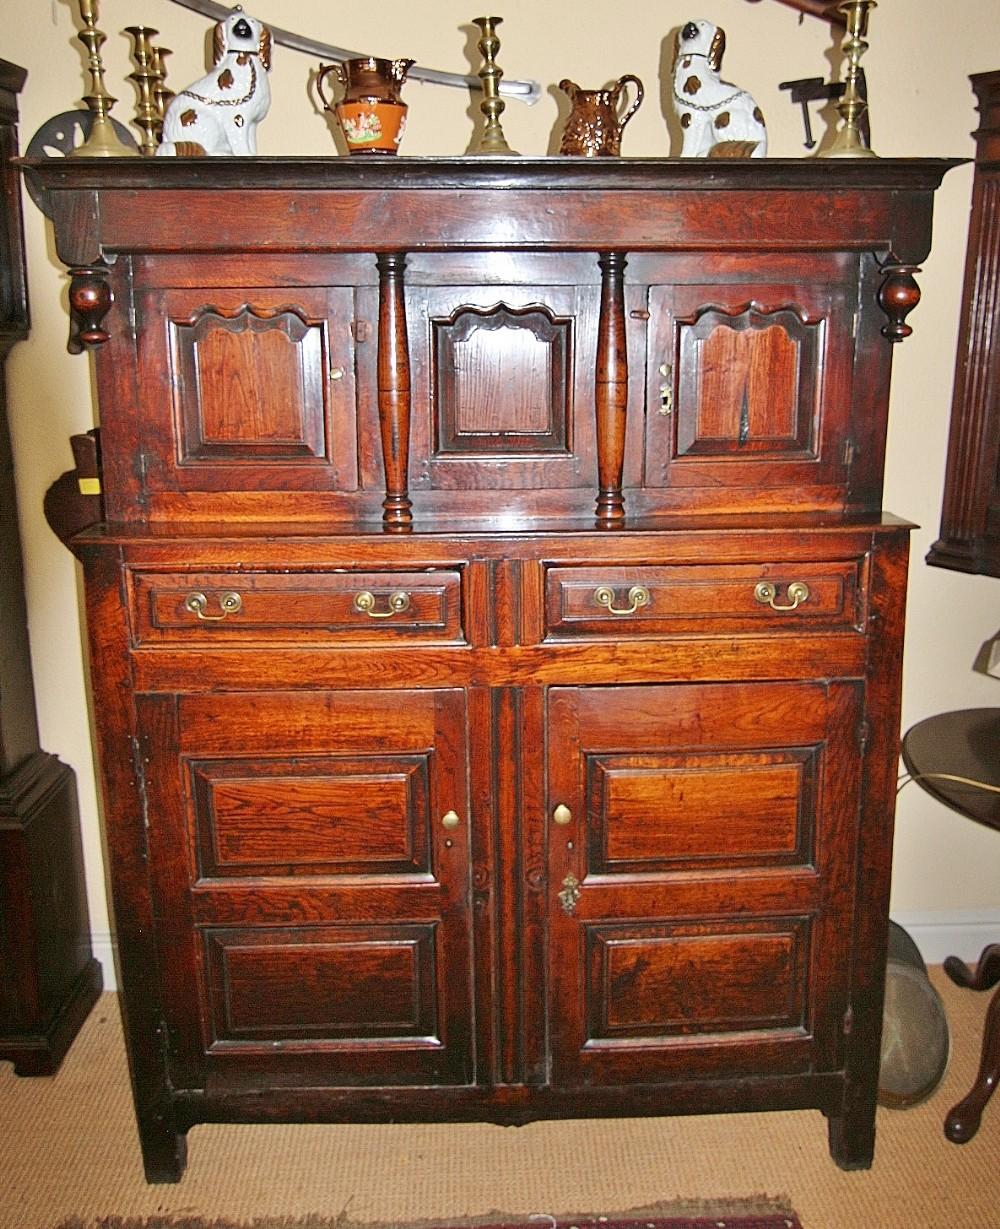 superb 18th century welsh oak deuddarn or court cupboard